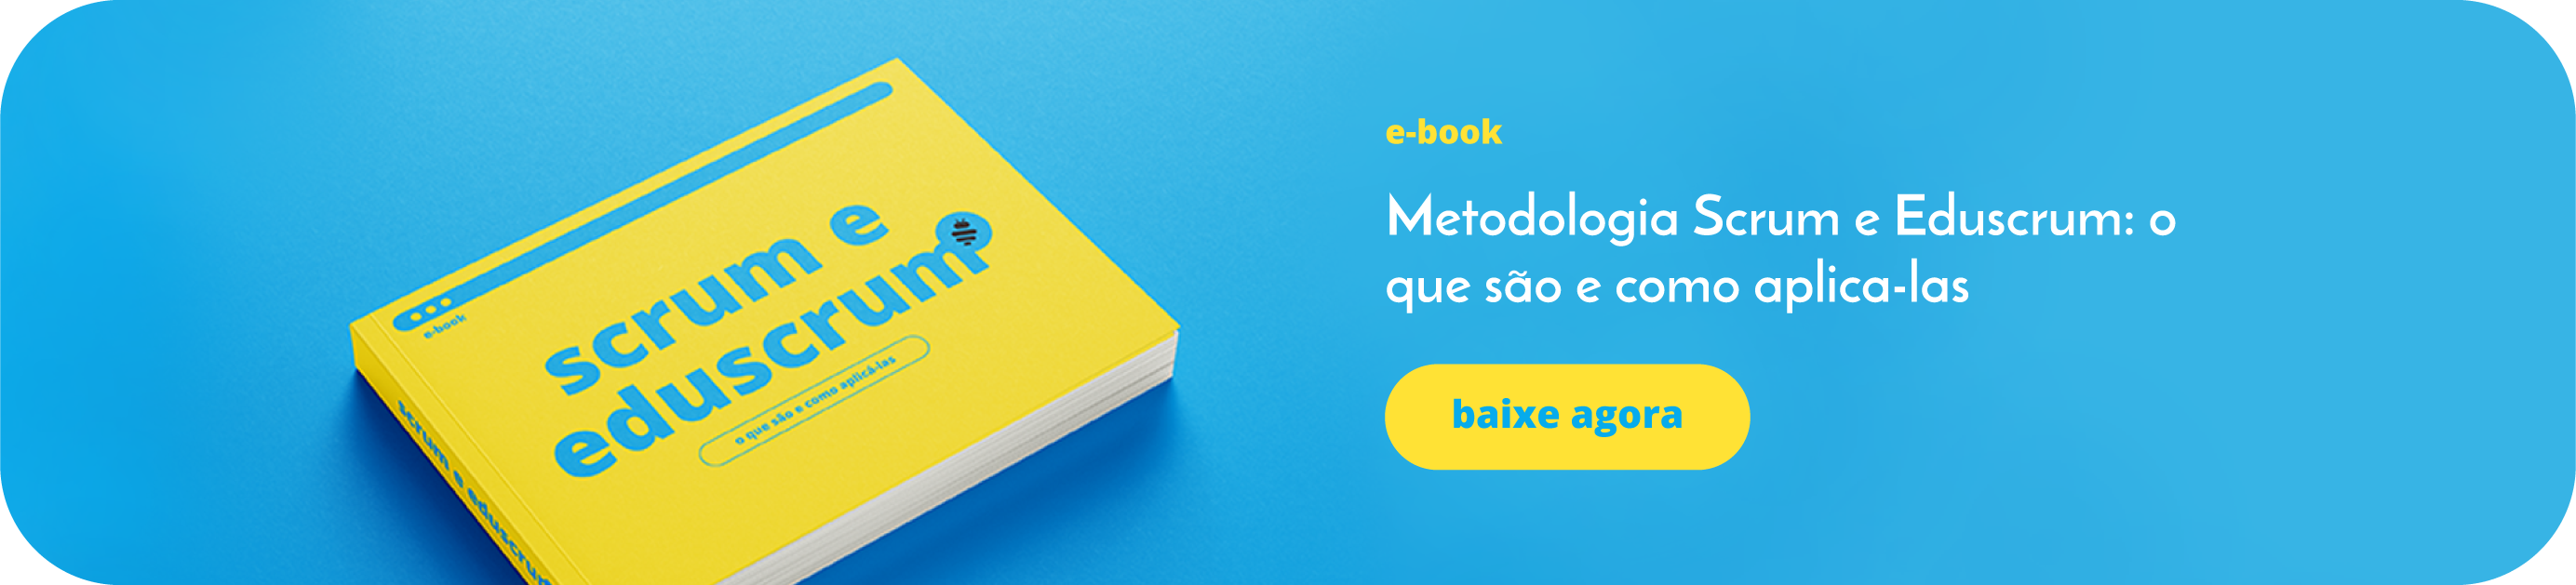 Baixe o Ebook Sobre metodologia Scrum e Eduscrum   Sambatech